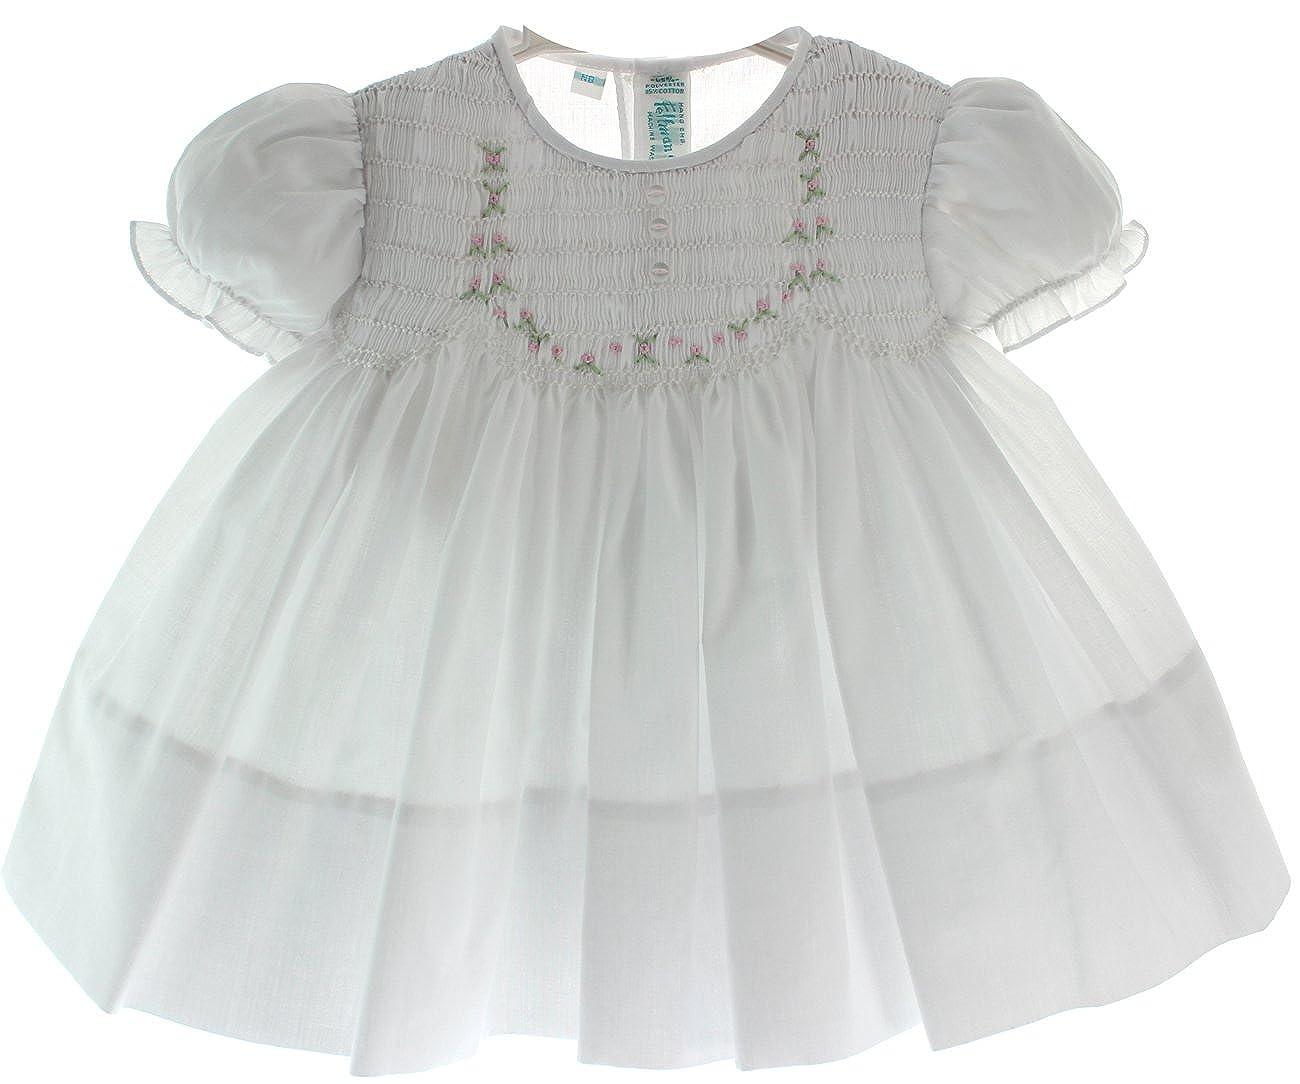 a11a4a9773d5 Amazon.com  Newborn Girls White Smocked Take Home Dress Feltman Brothers  (NB)  Clothing